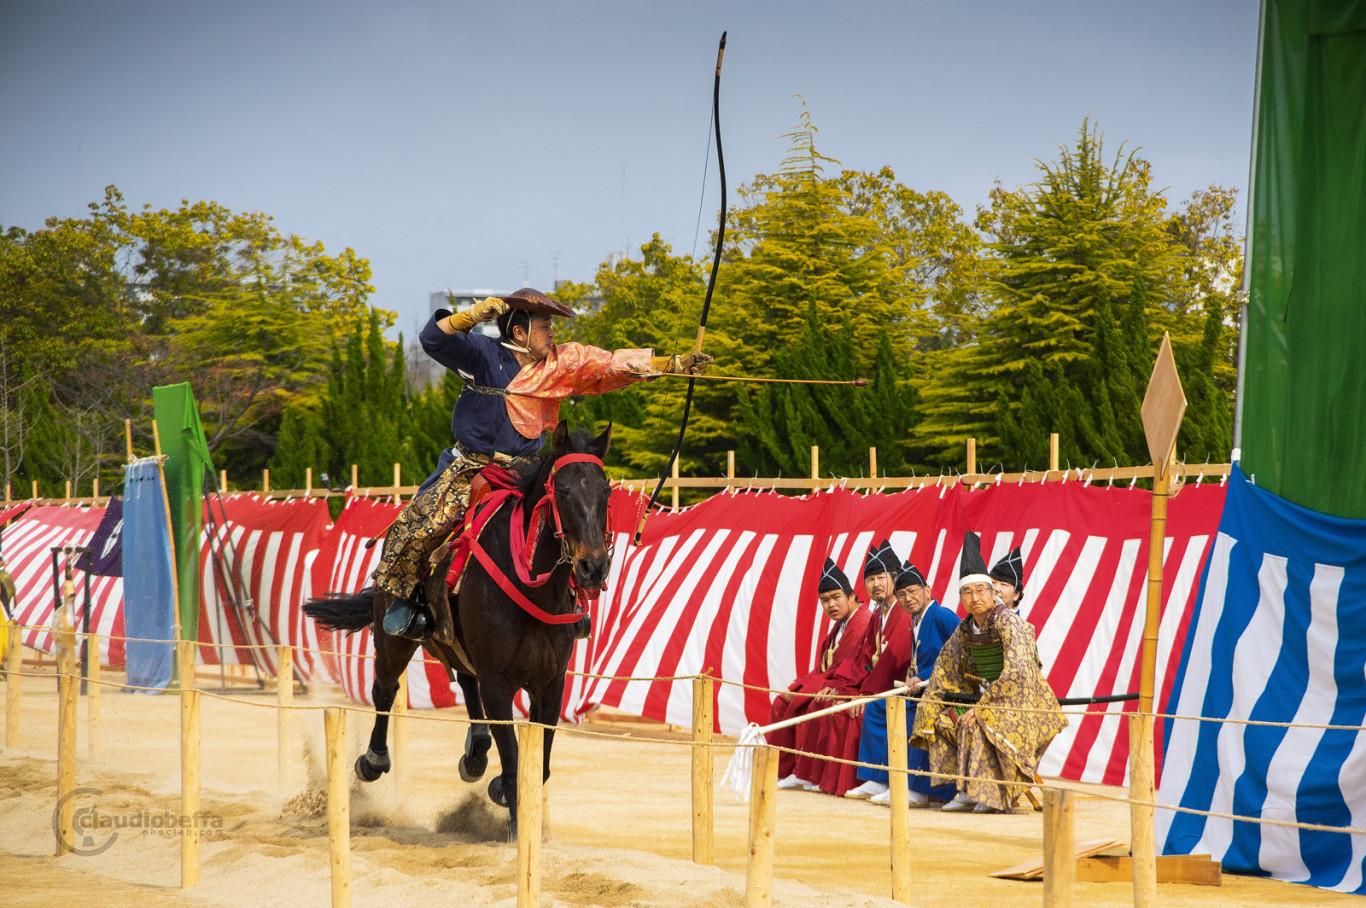 Japan, Yabusame, Traditional mounted archery, archer shoots arrow